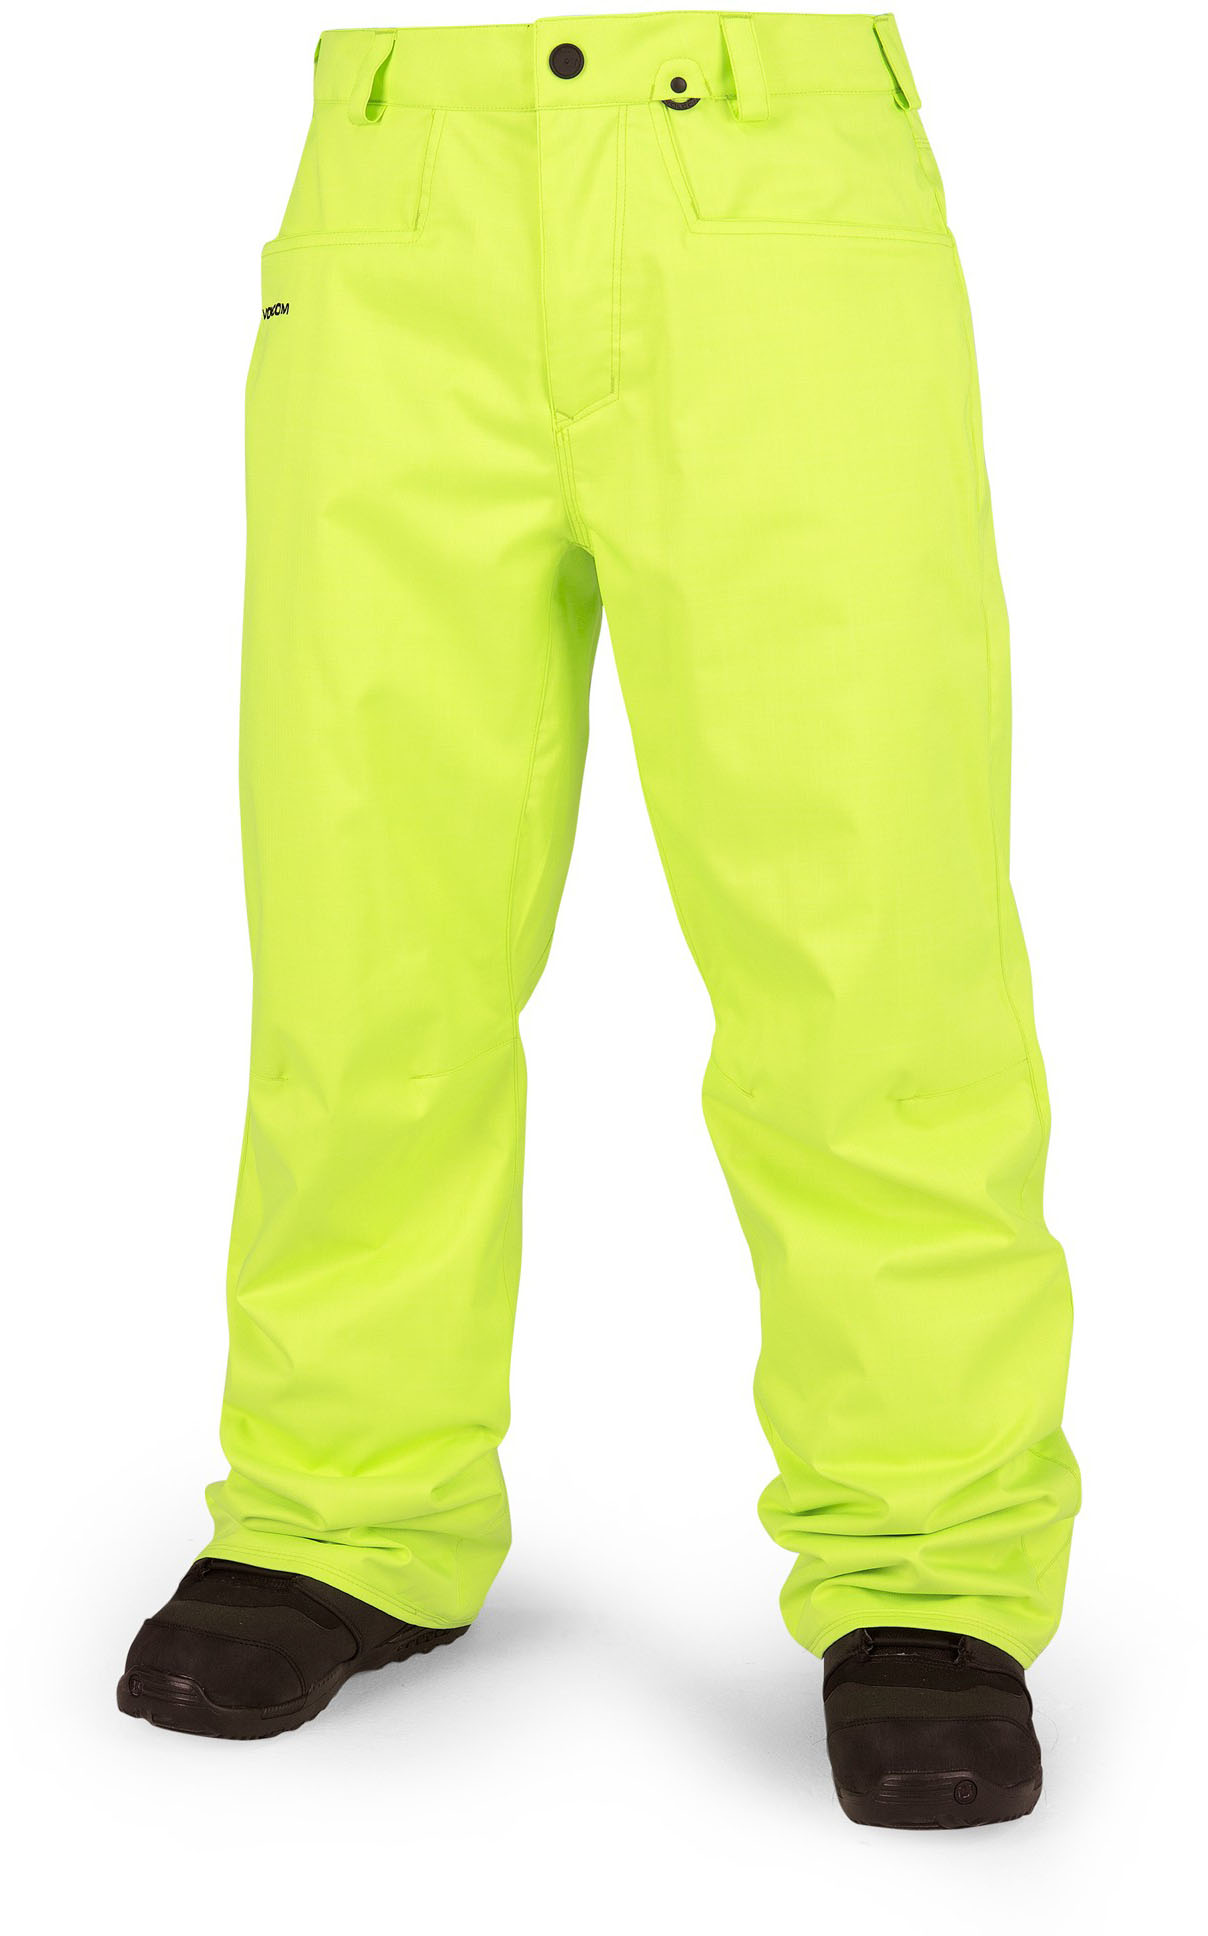 image volcom-carbon-yellow-jpg